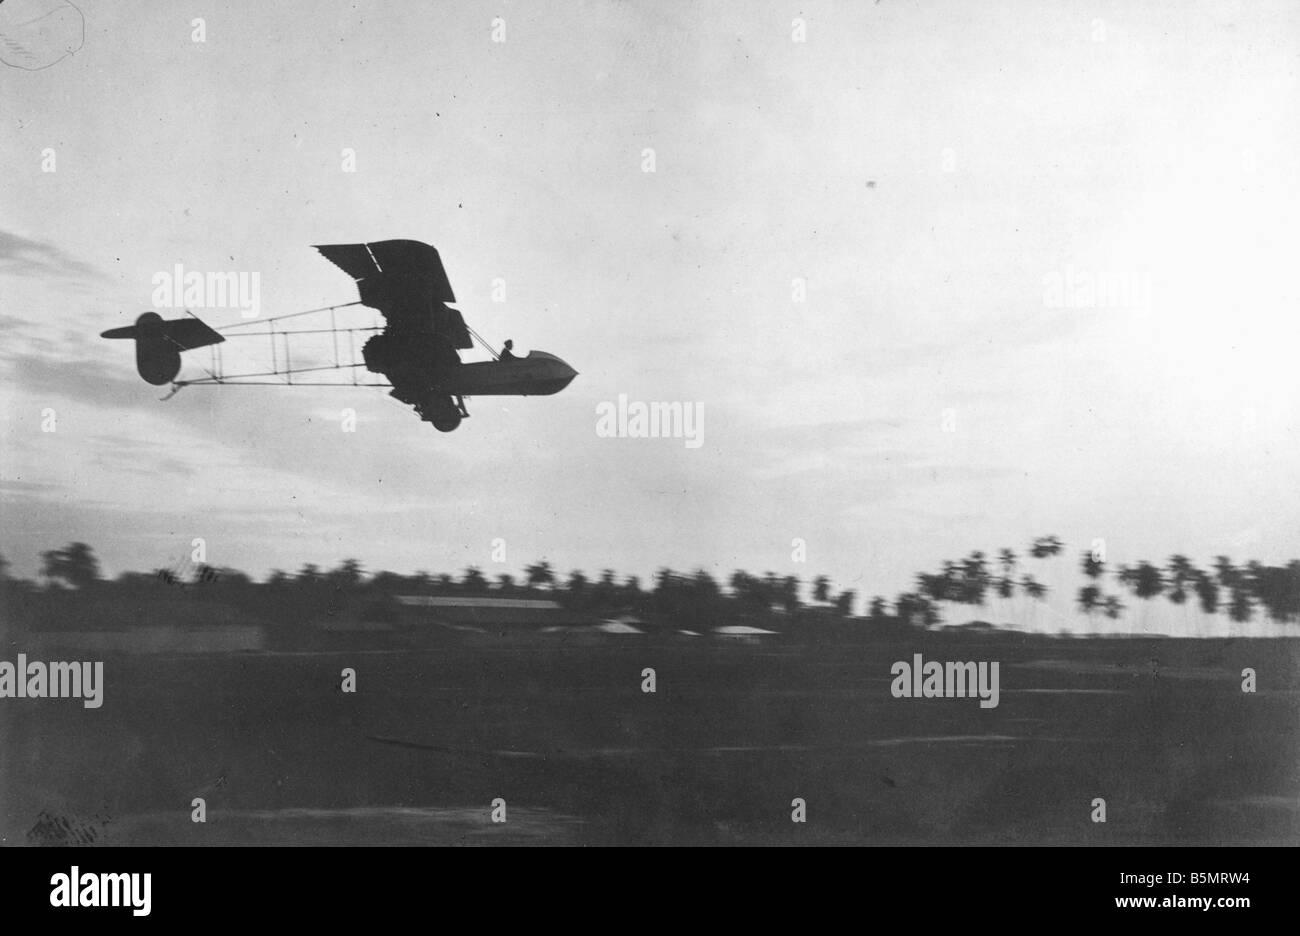 9AF 1914 0 0 A5 3 militärische Flugzeug Ger Ostafrika 1. Weltkrieg Krieg in den Kolonien Deutsch-Ostafrika heute Tansania Militärflugzeug Stockfoto